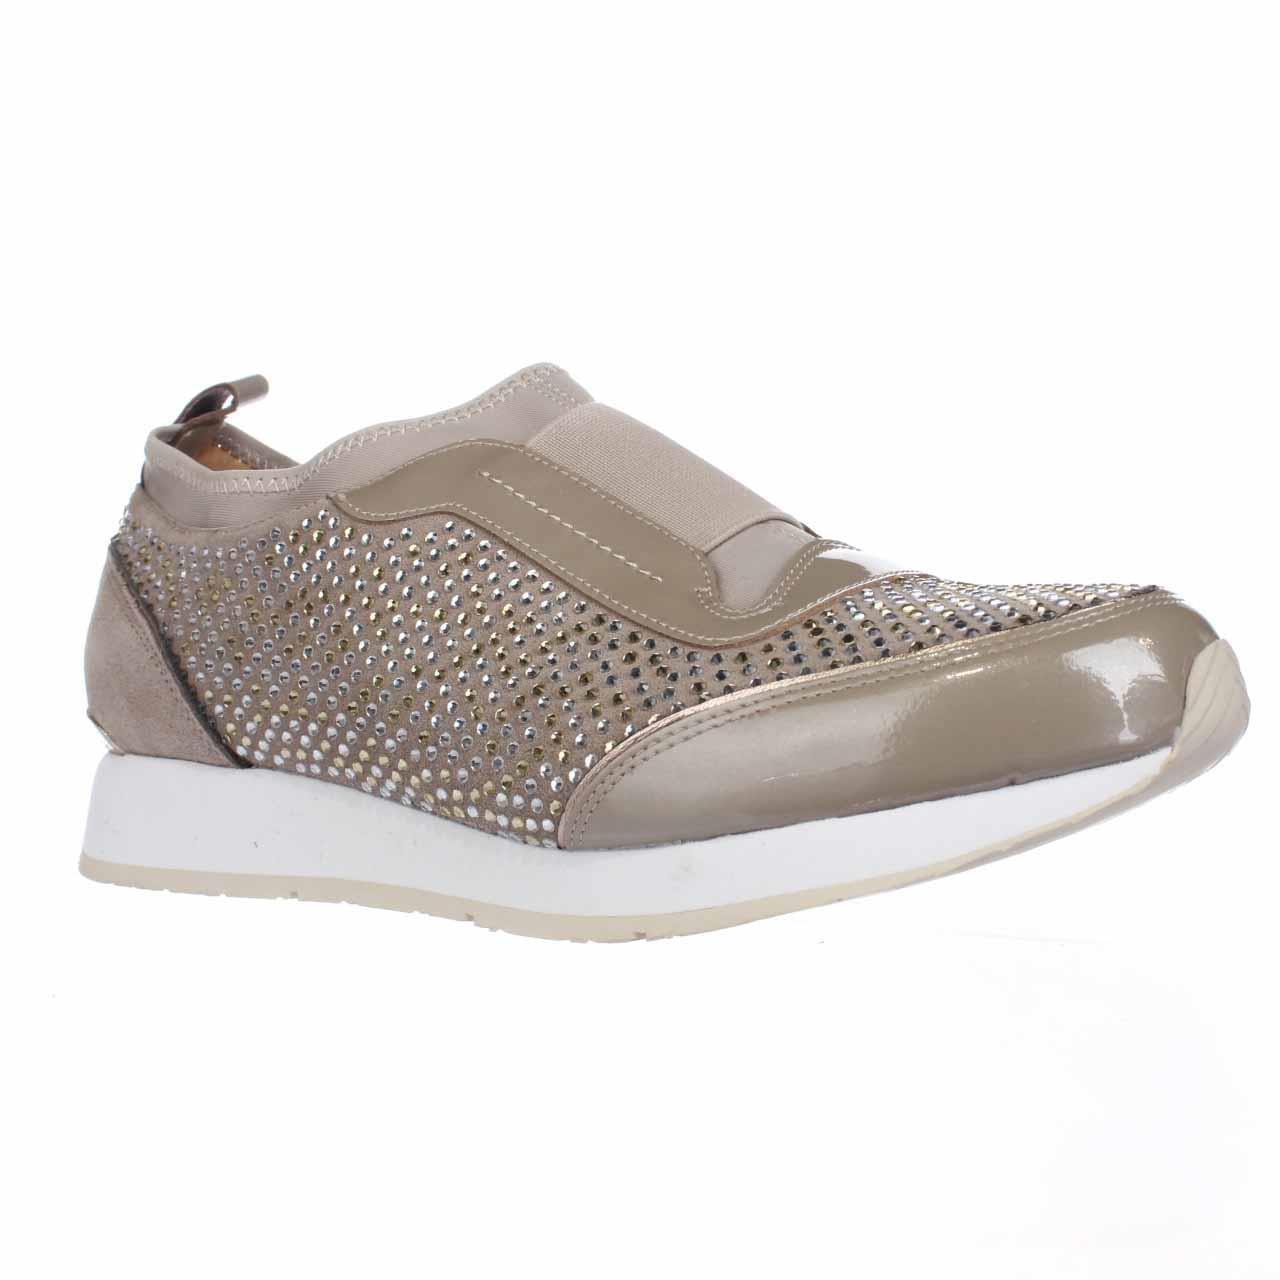 Womens Donald J Pliner Ryley Rhinestone Pull On Fashion Sneakers, Beige by Donald J Pliner